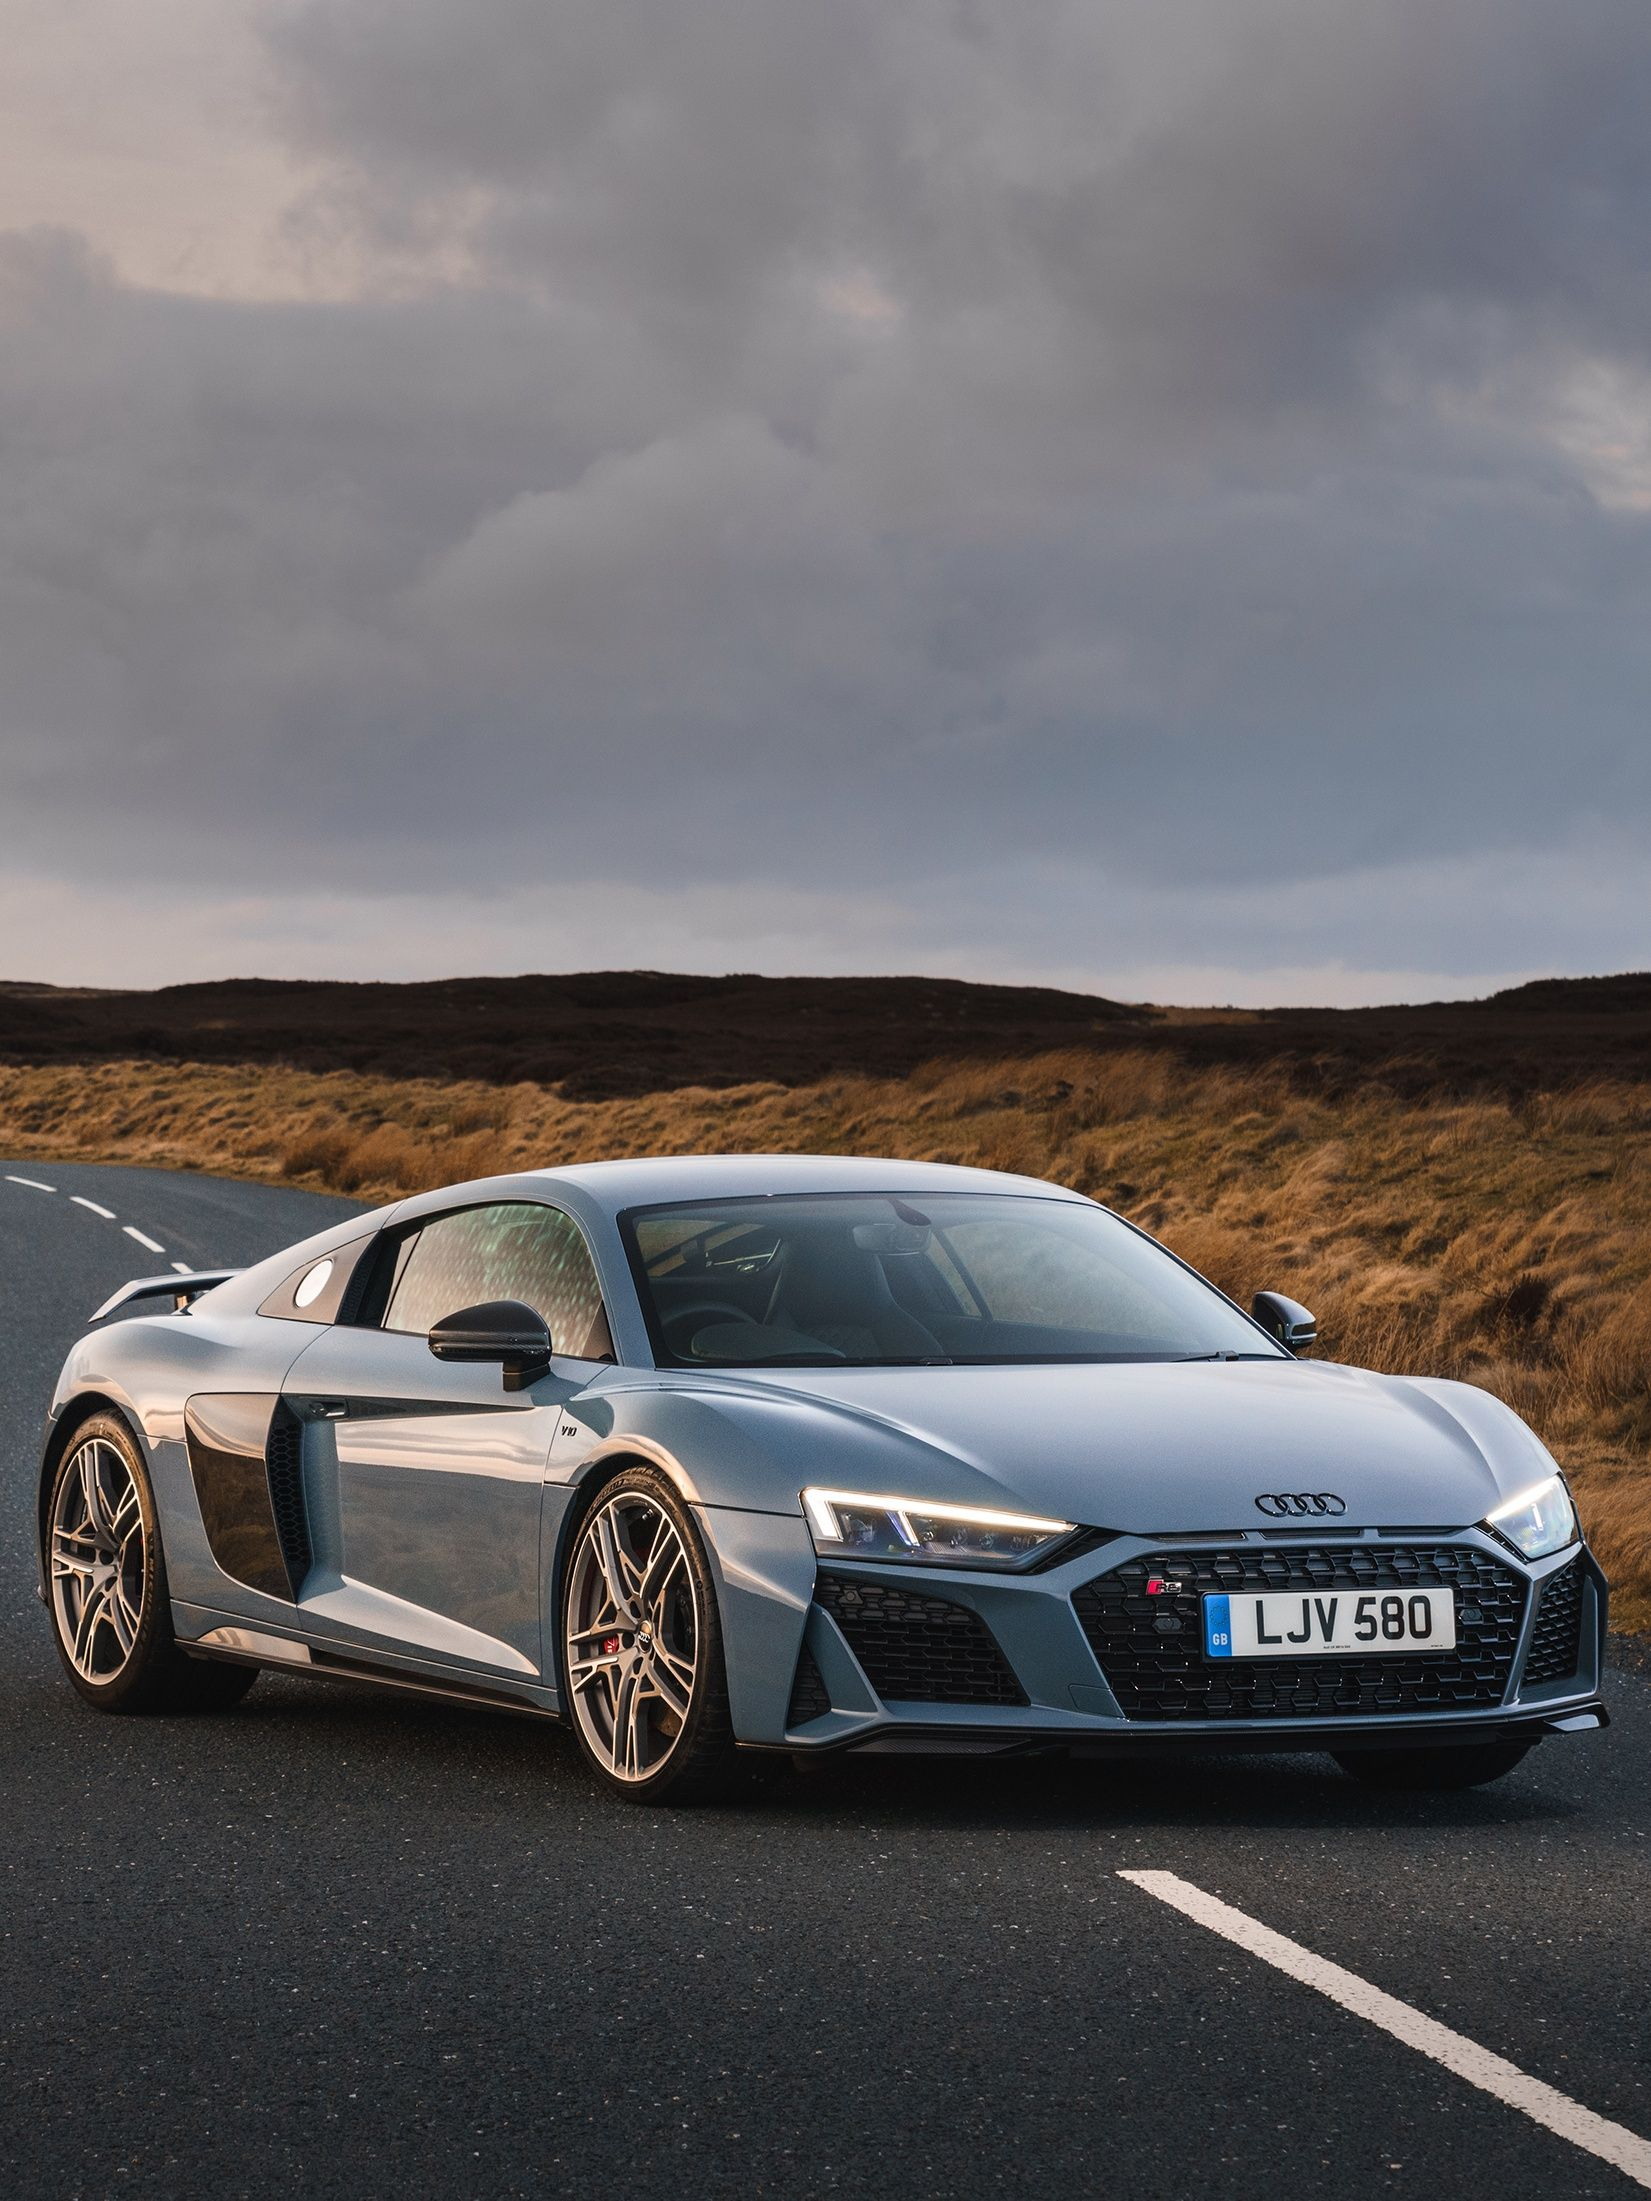 2019 Audi R8 V10 quattro performance coupé - The MAN #audir8